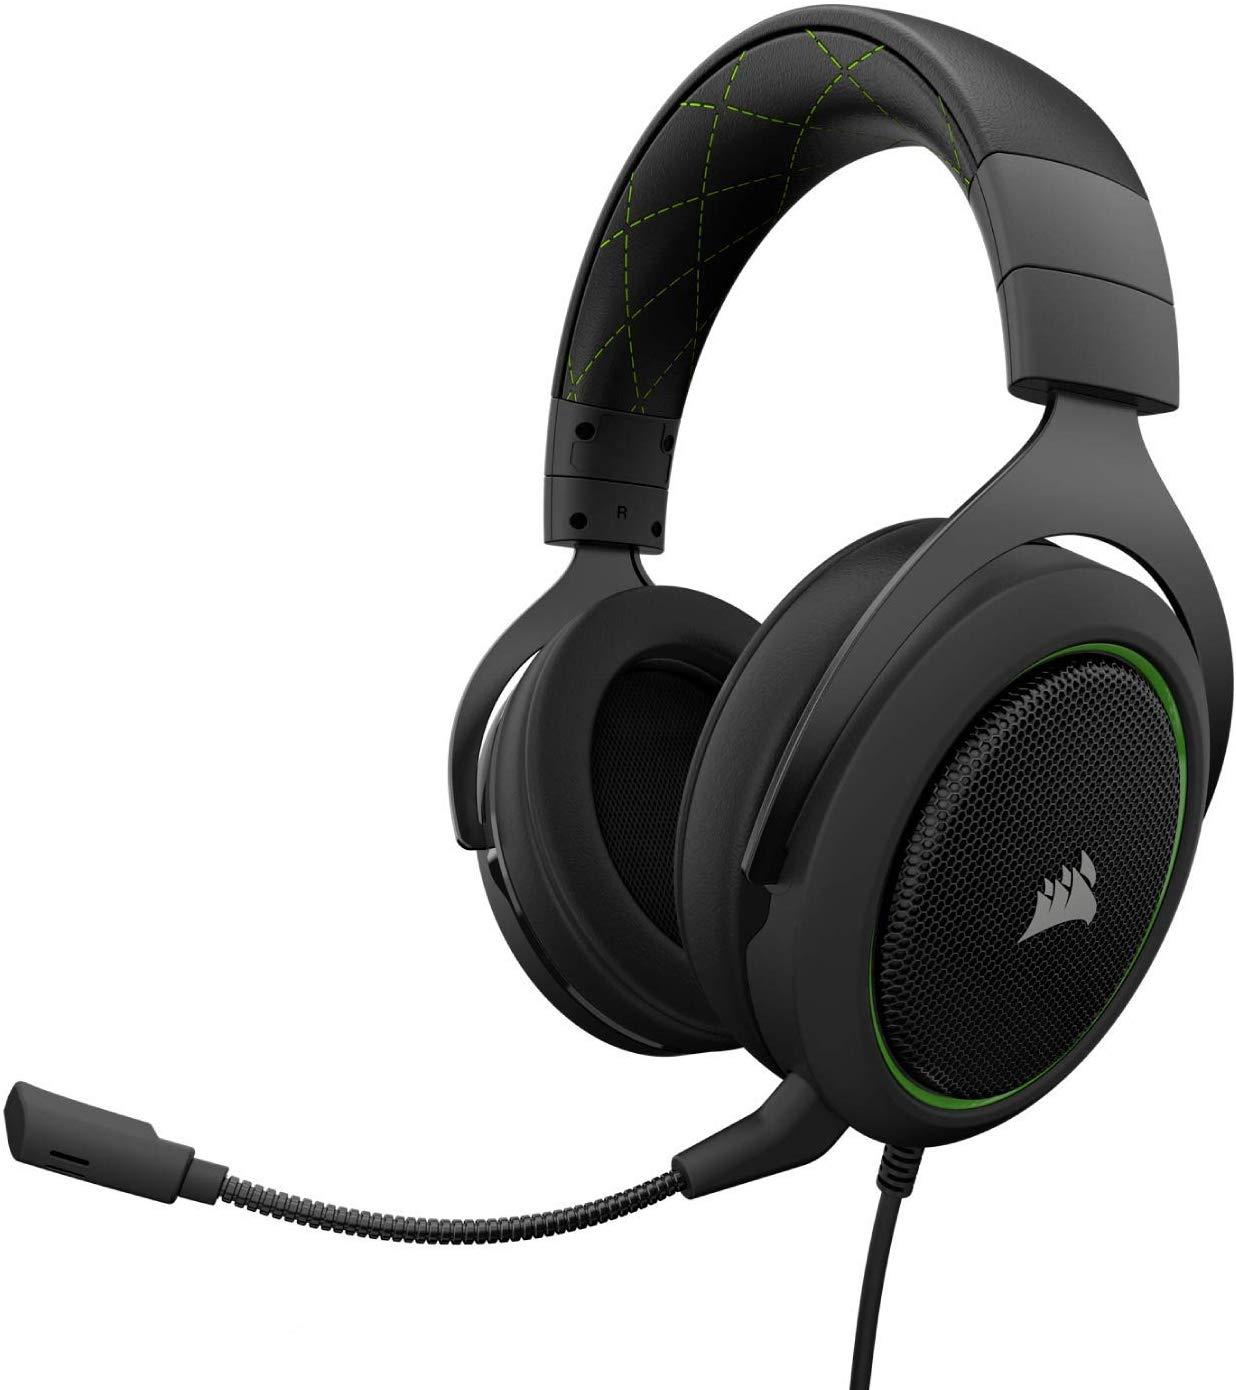 Corsair HS50 auriculares gaming solo 38.9€